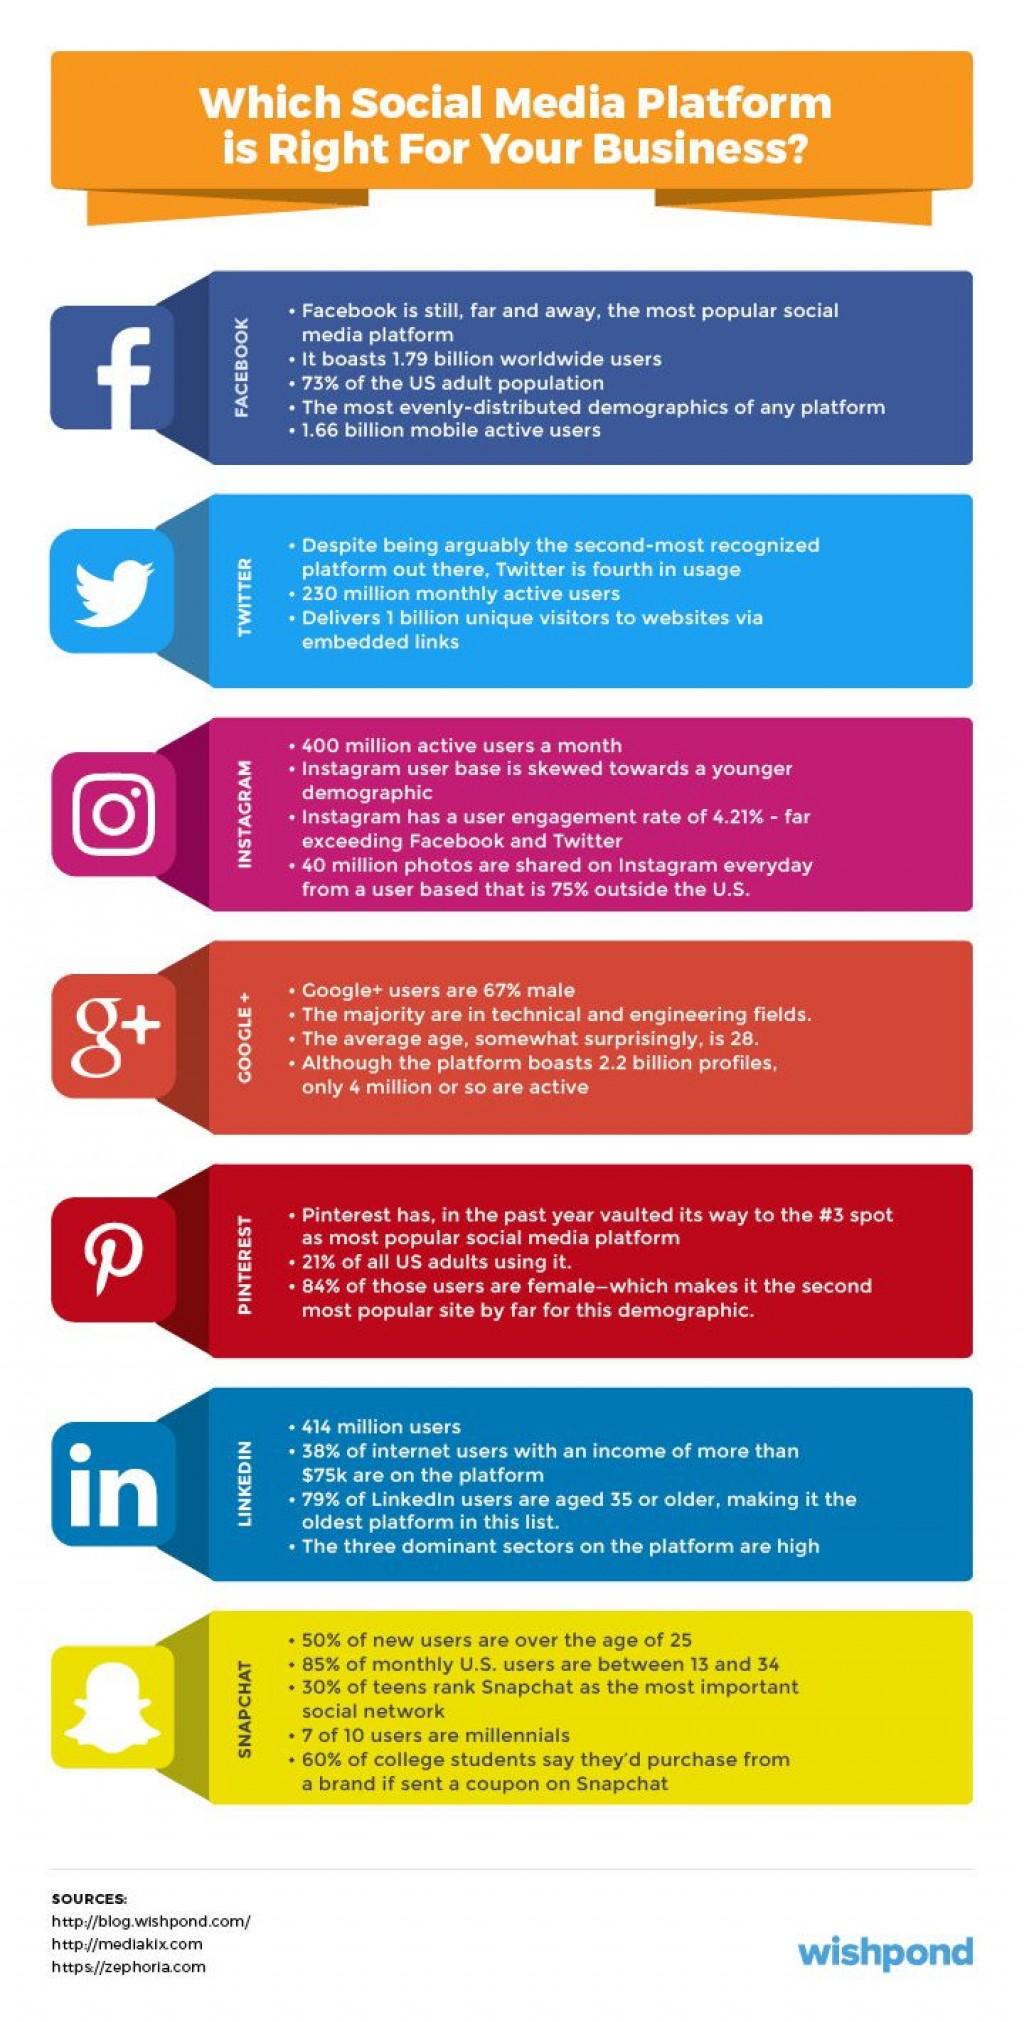 005 Impressive Social Media Marketing Plan Template 2018 Photo Large